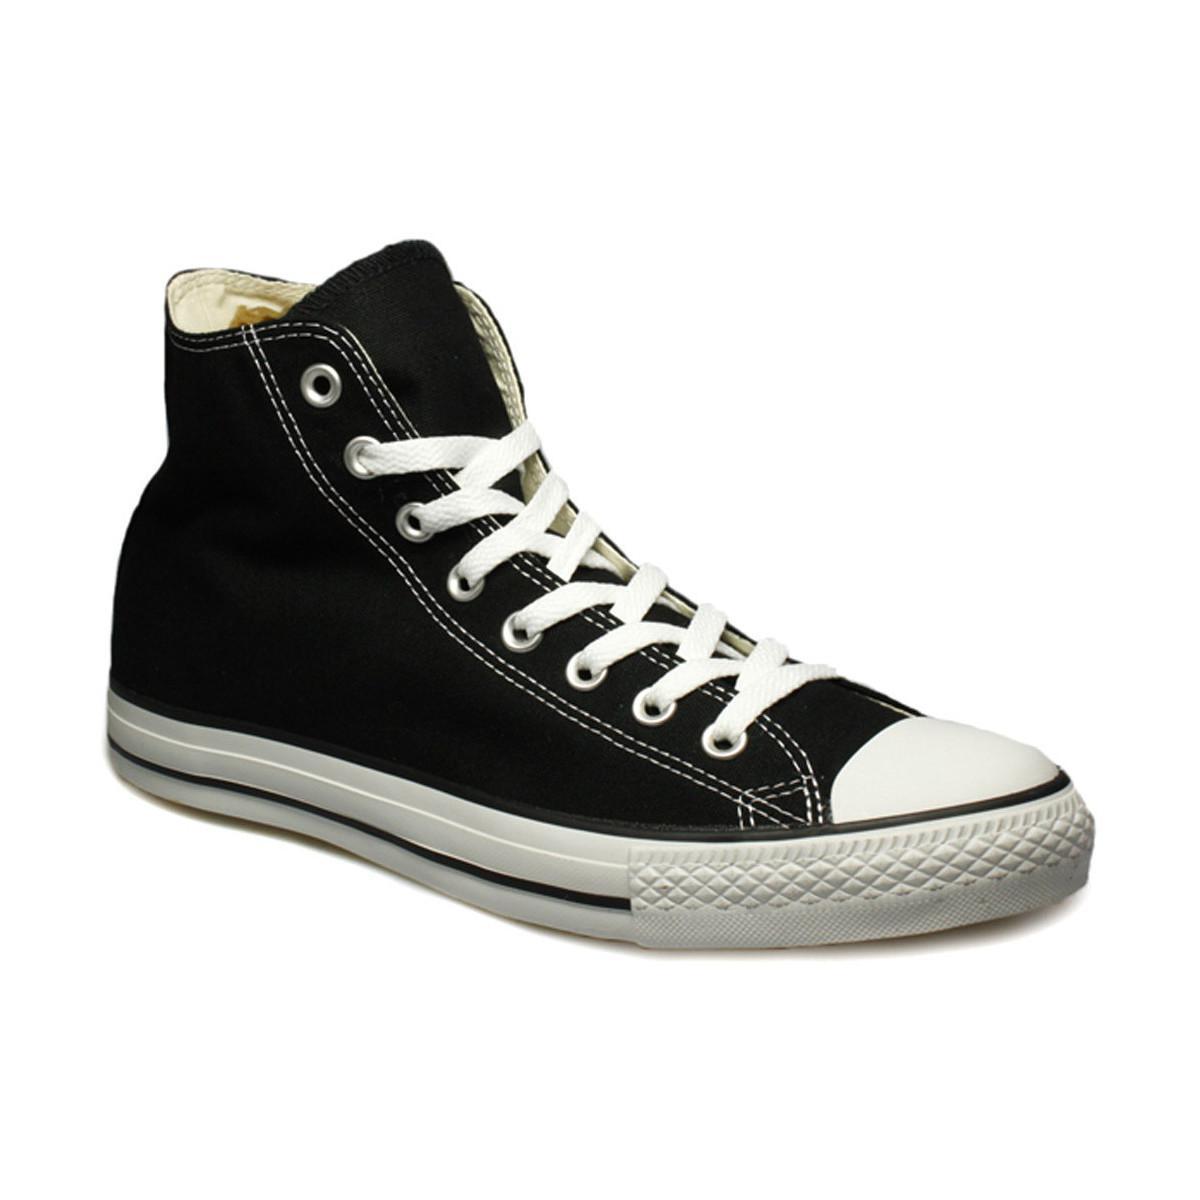 Shoes Mens Hi All Converse Men's Trainers high Womens Star Black pdwqX8